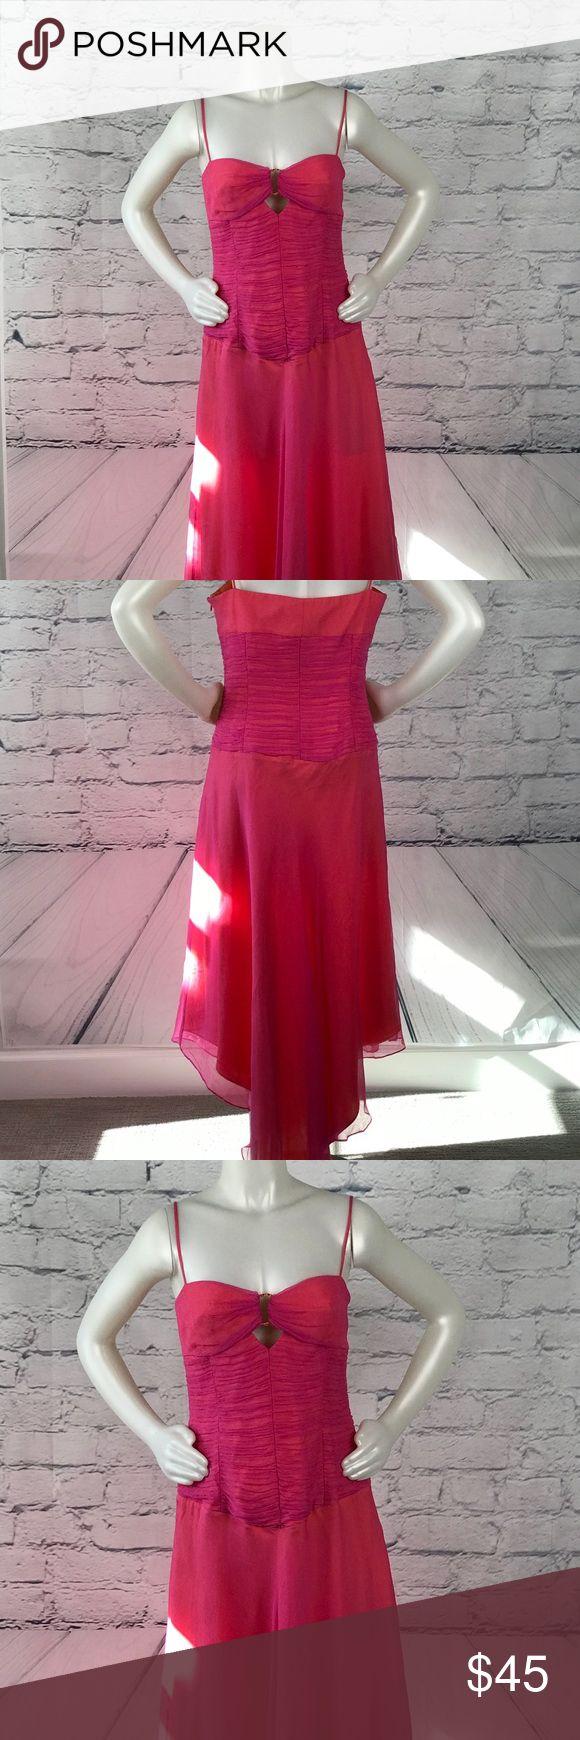 "Laundry Shelli Segal Silk Handkerchief Dress B405 Laundry Shelli Segal Silk Handkerchief Dress B405 Brand New With Tag NWT Size 12 Waist 19"" Bust 16"" Length 45"" Laundry By Shelli Segal Dresses Asymmetrical"